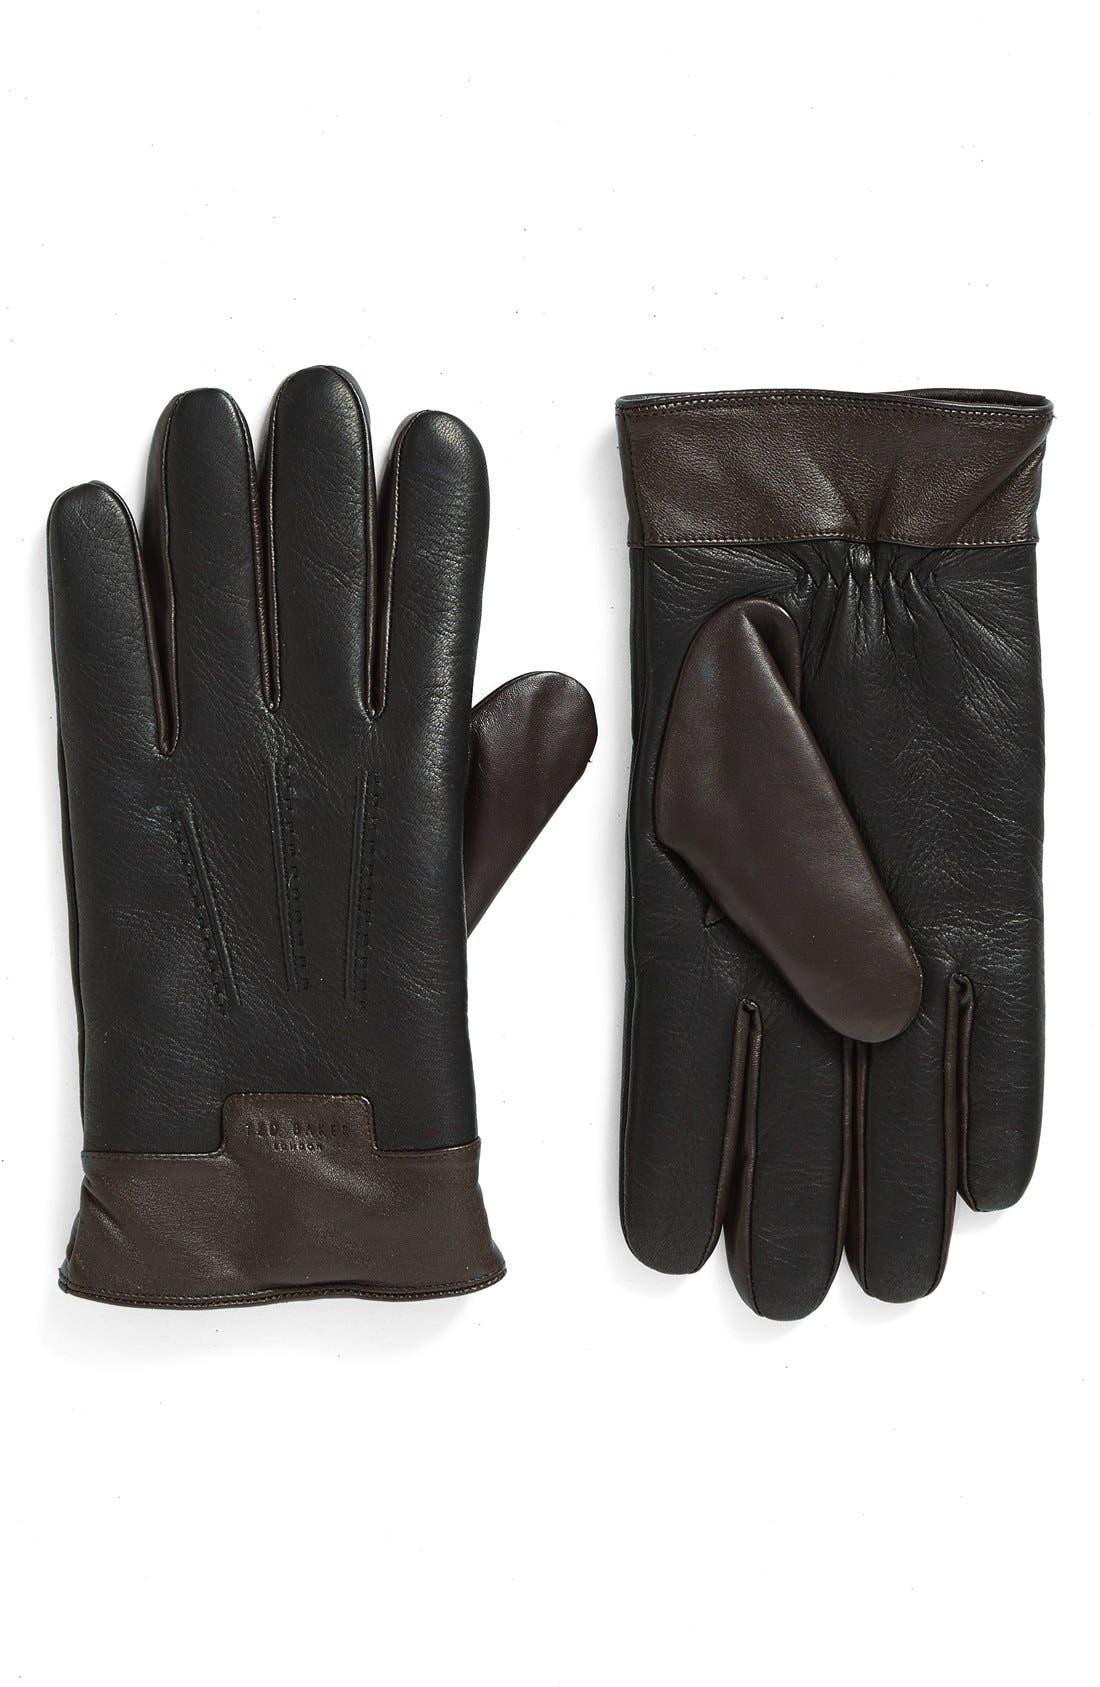 Alternate Image 1 Selected - Ted Baker London Leather Gloves